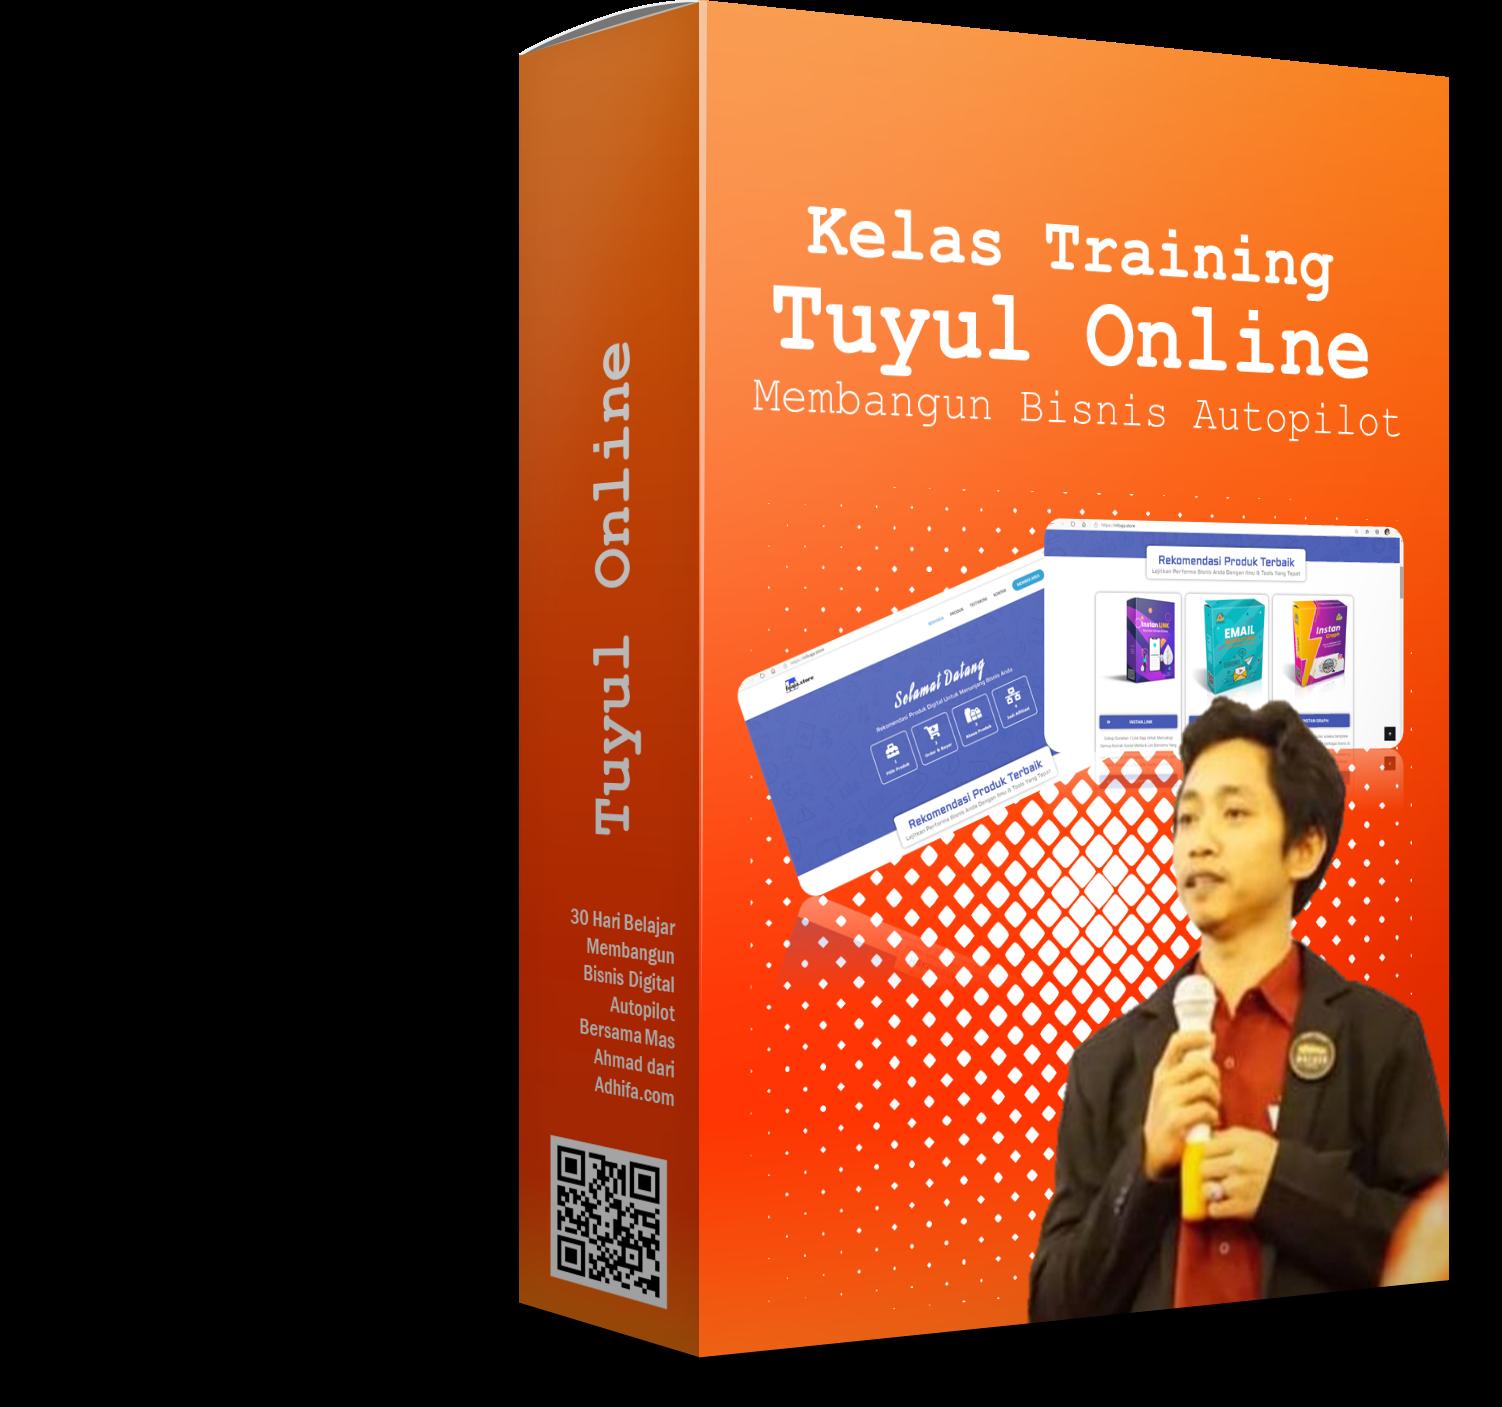 Tuyul Online